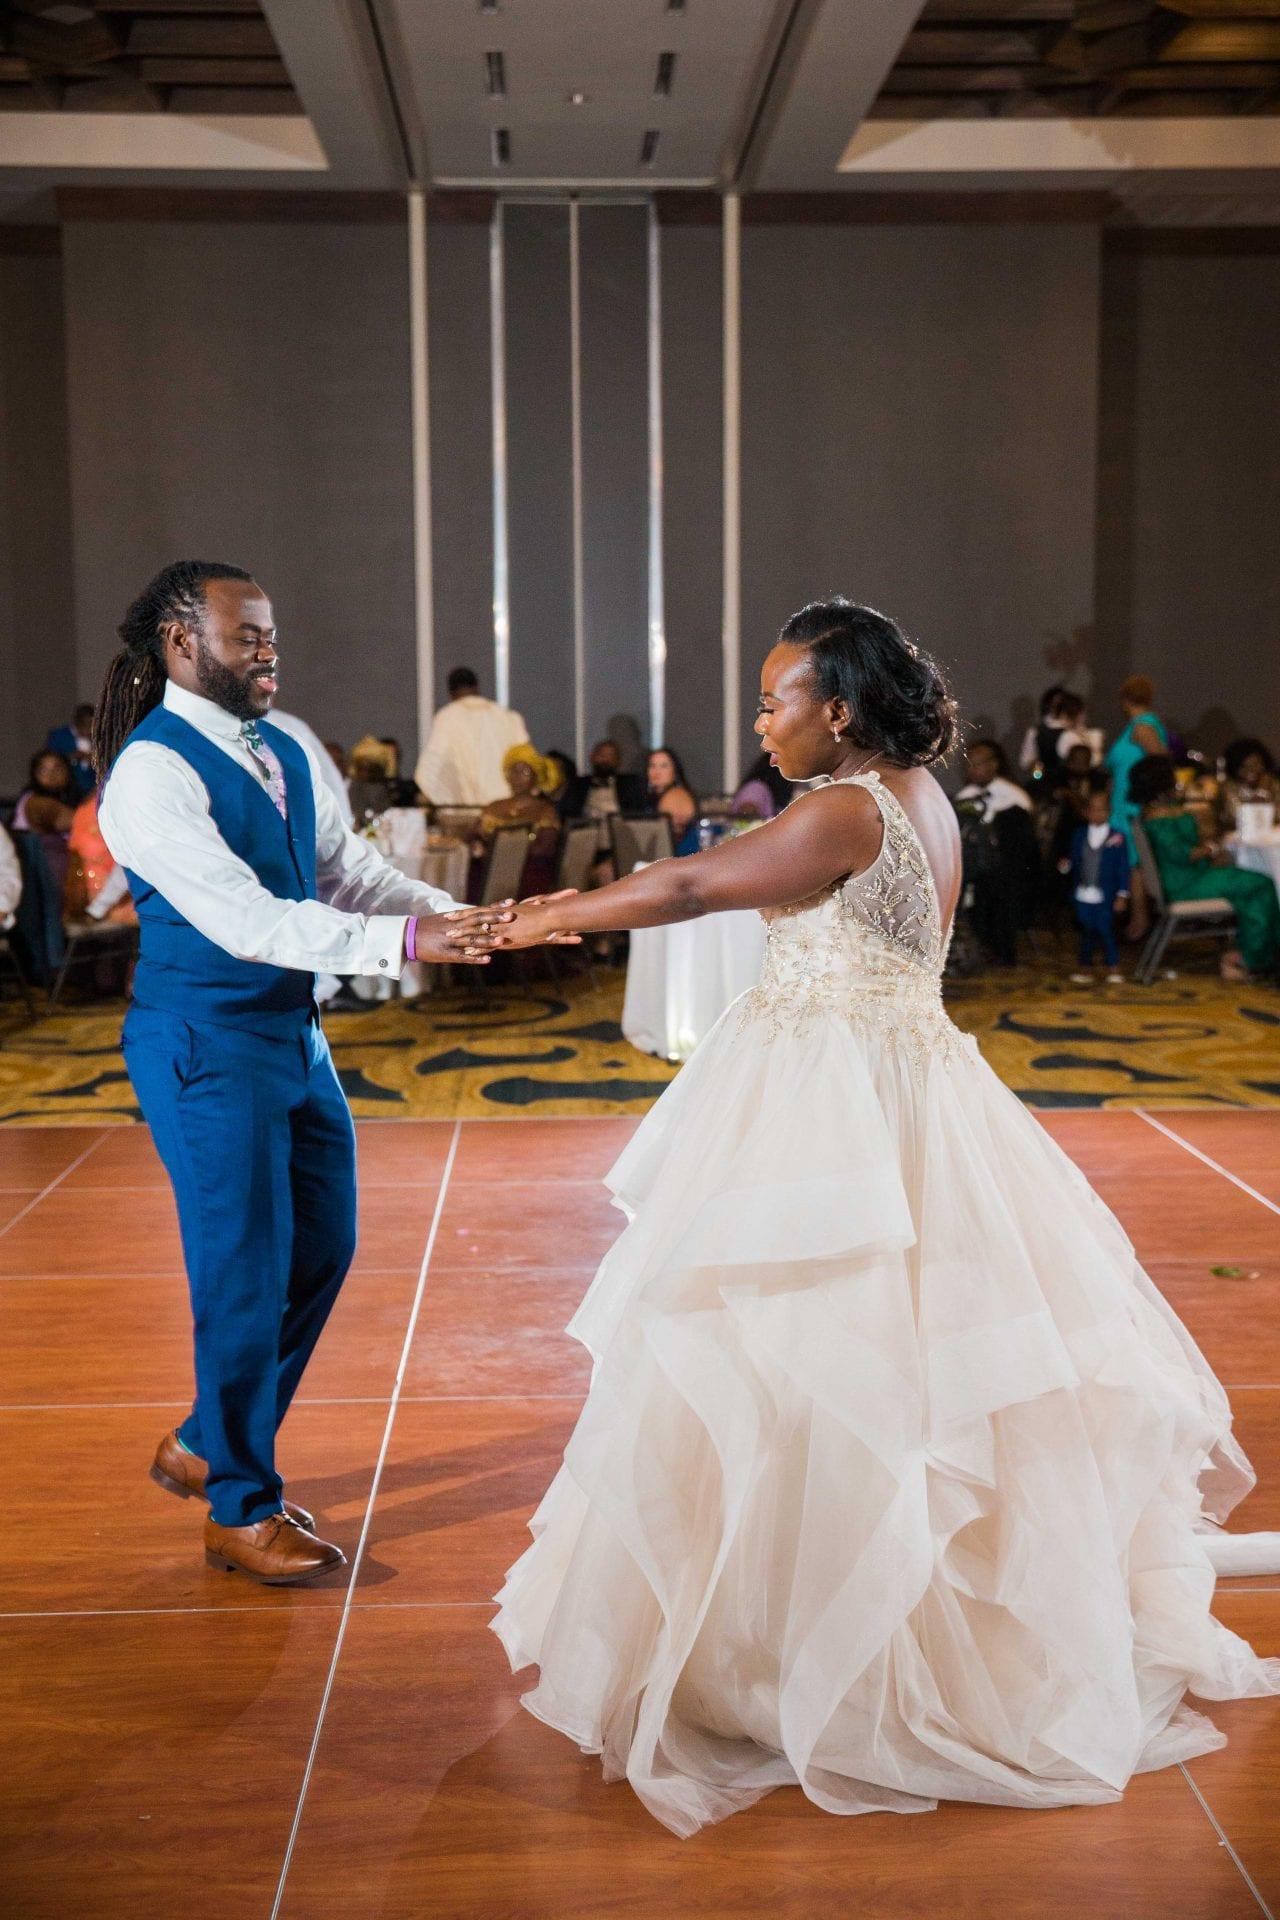 Onyema wedding La Cantera dancing